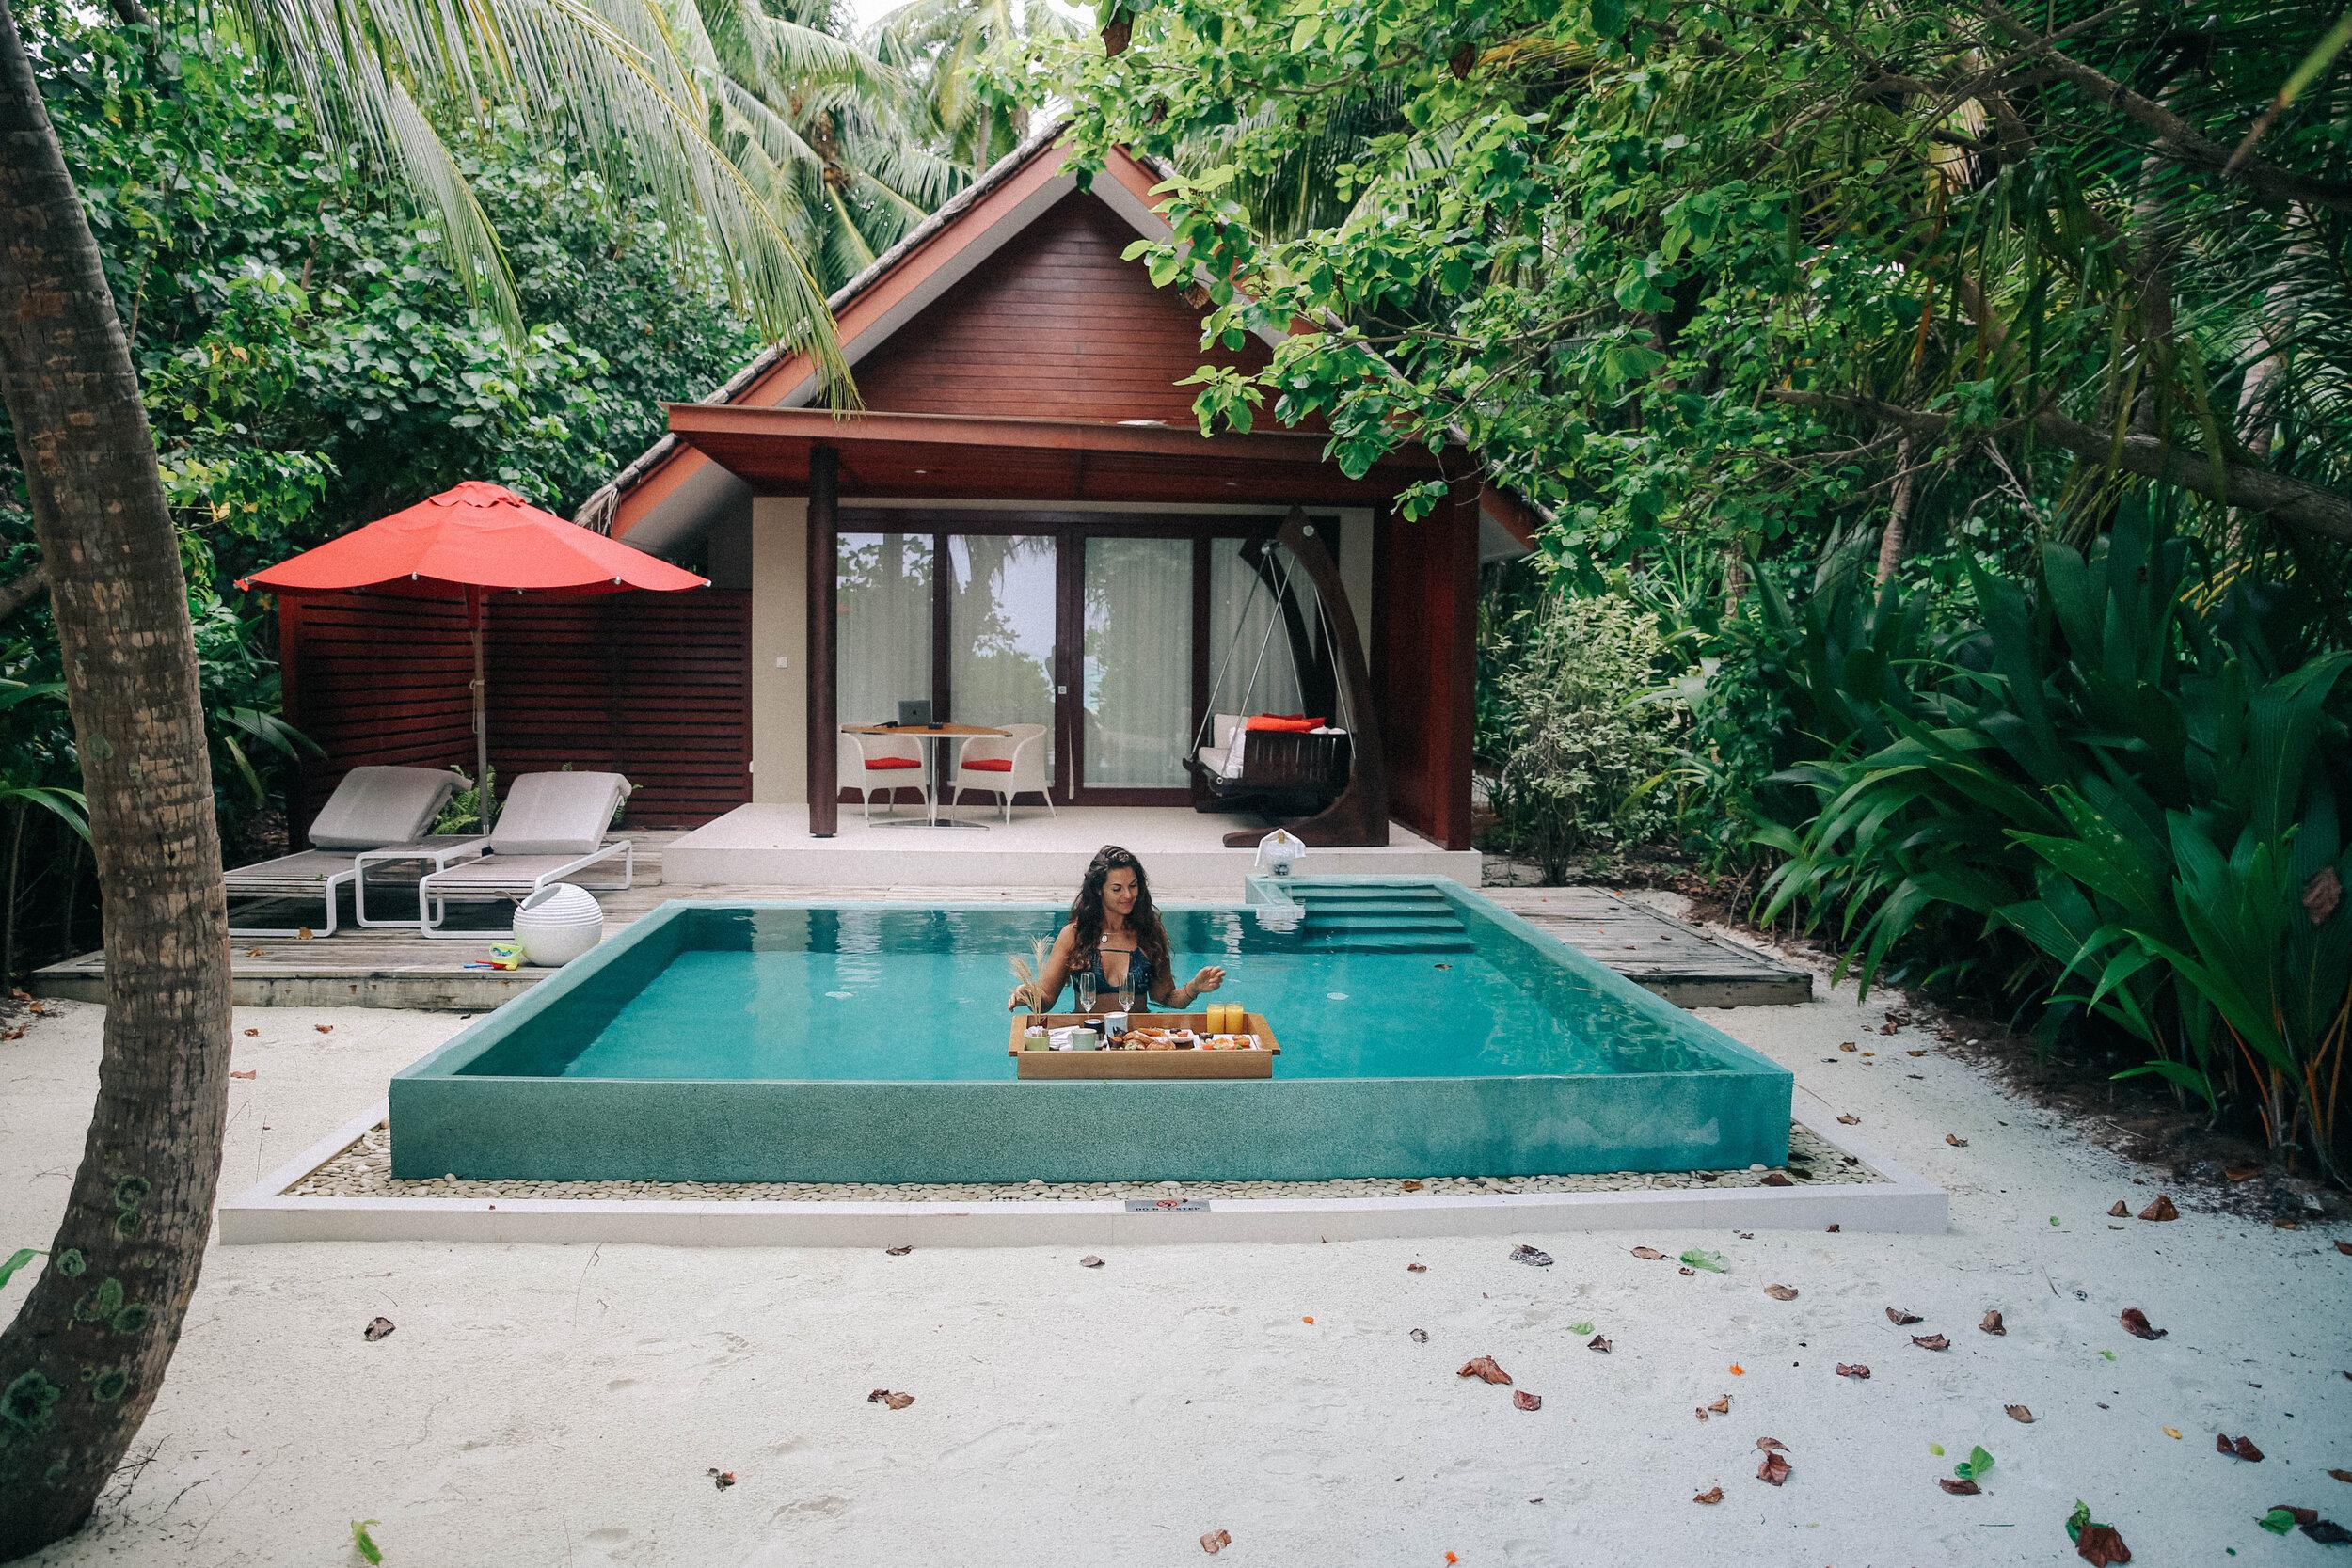 Niyama maldives, fitness retreats in Maldives, fitness holidays in Maldives